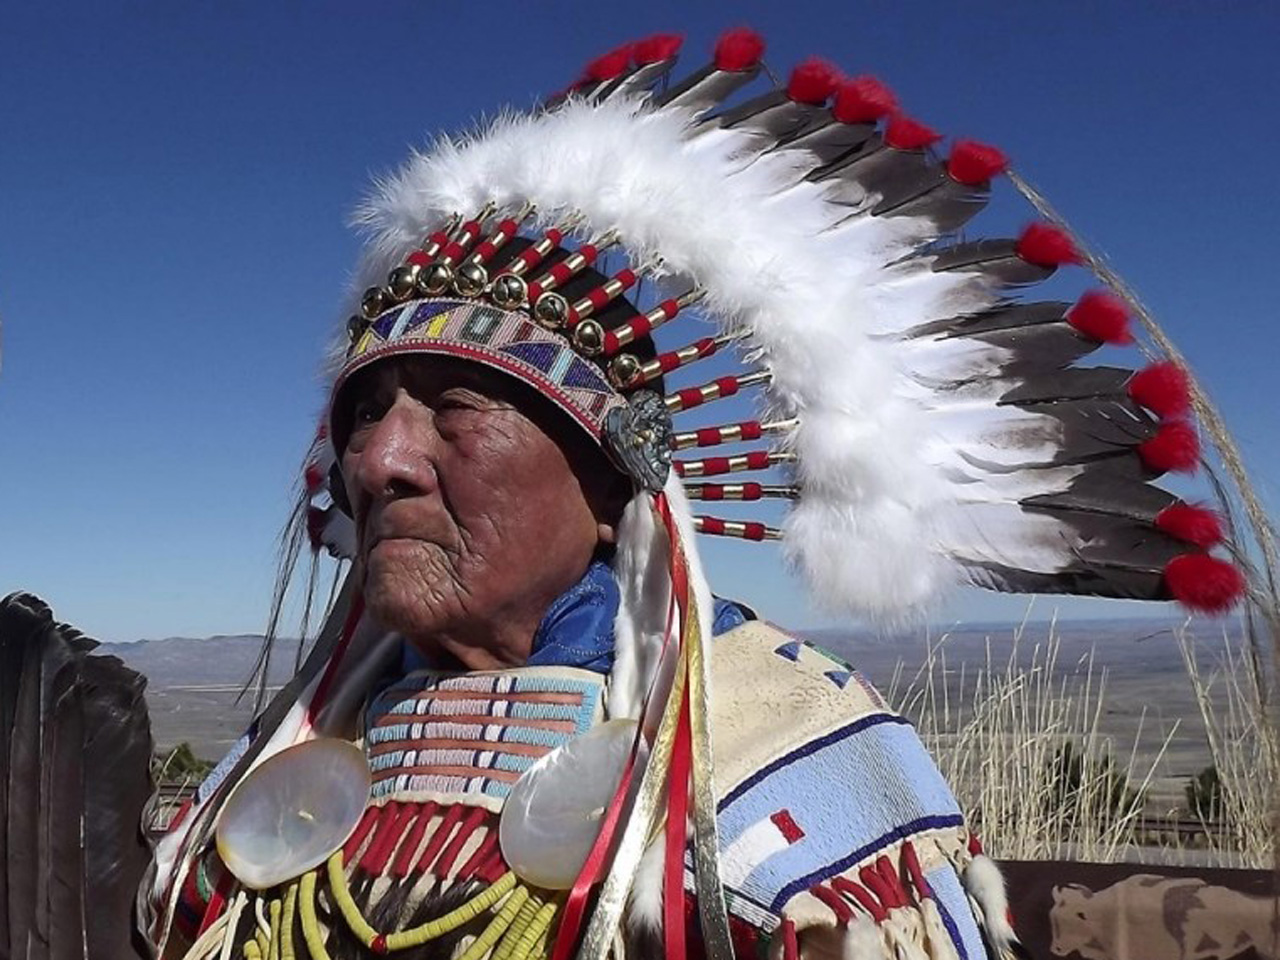 Last Plains Indian war chief dies at age 102 - CBS News